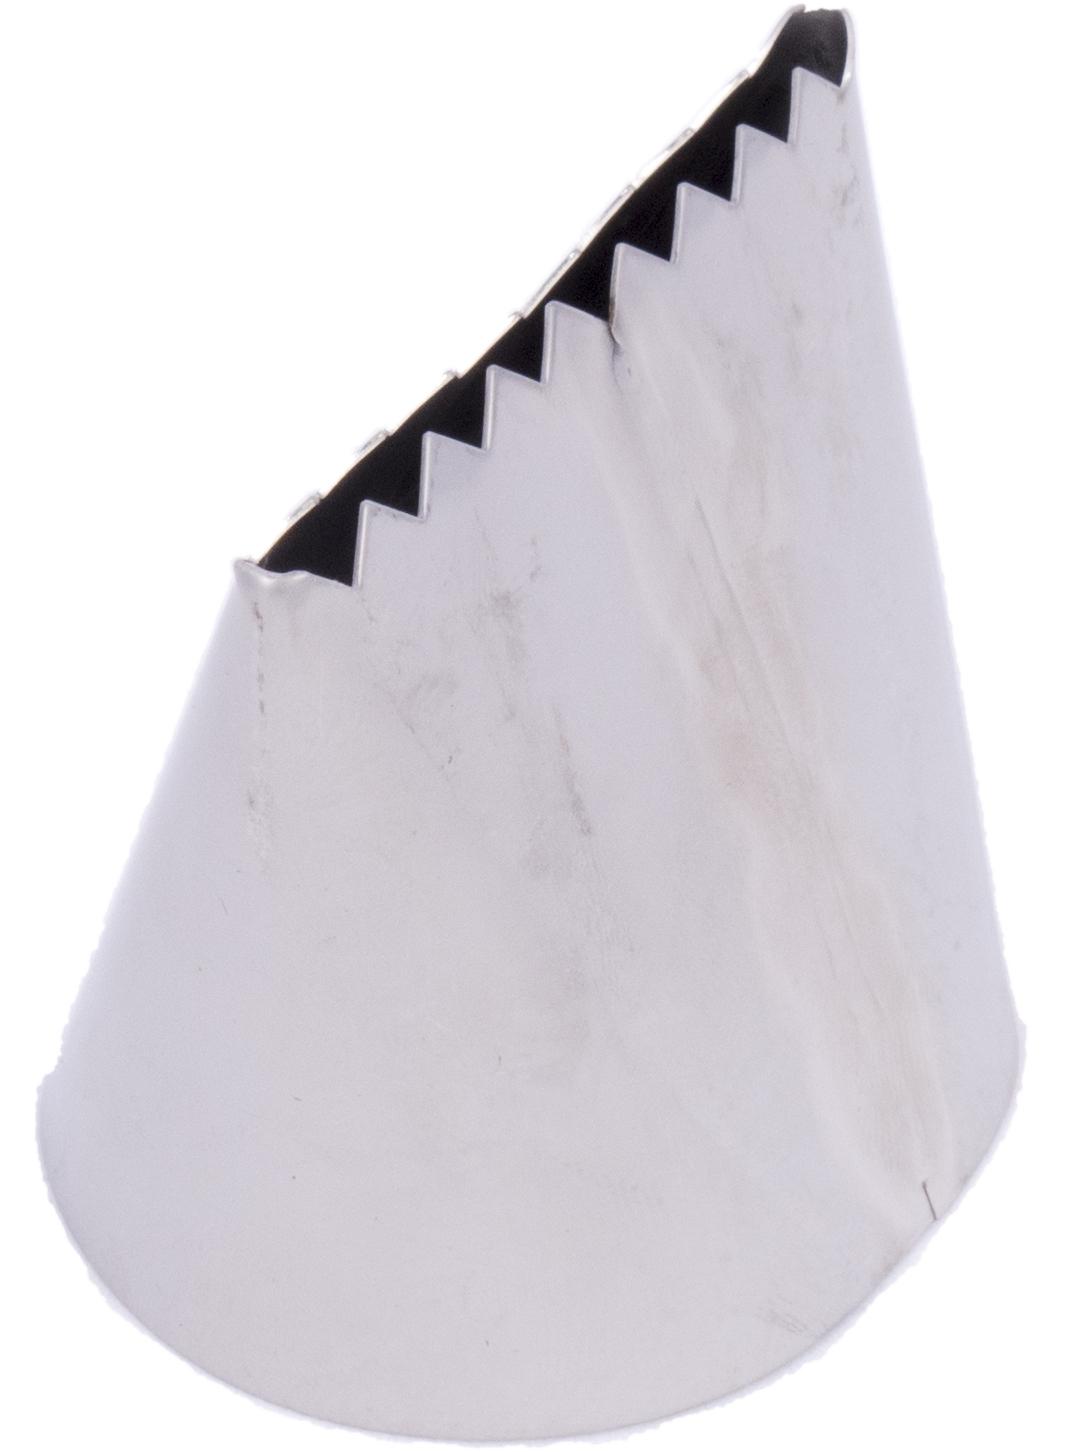 Kanttyll krusig rf. 60 mm